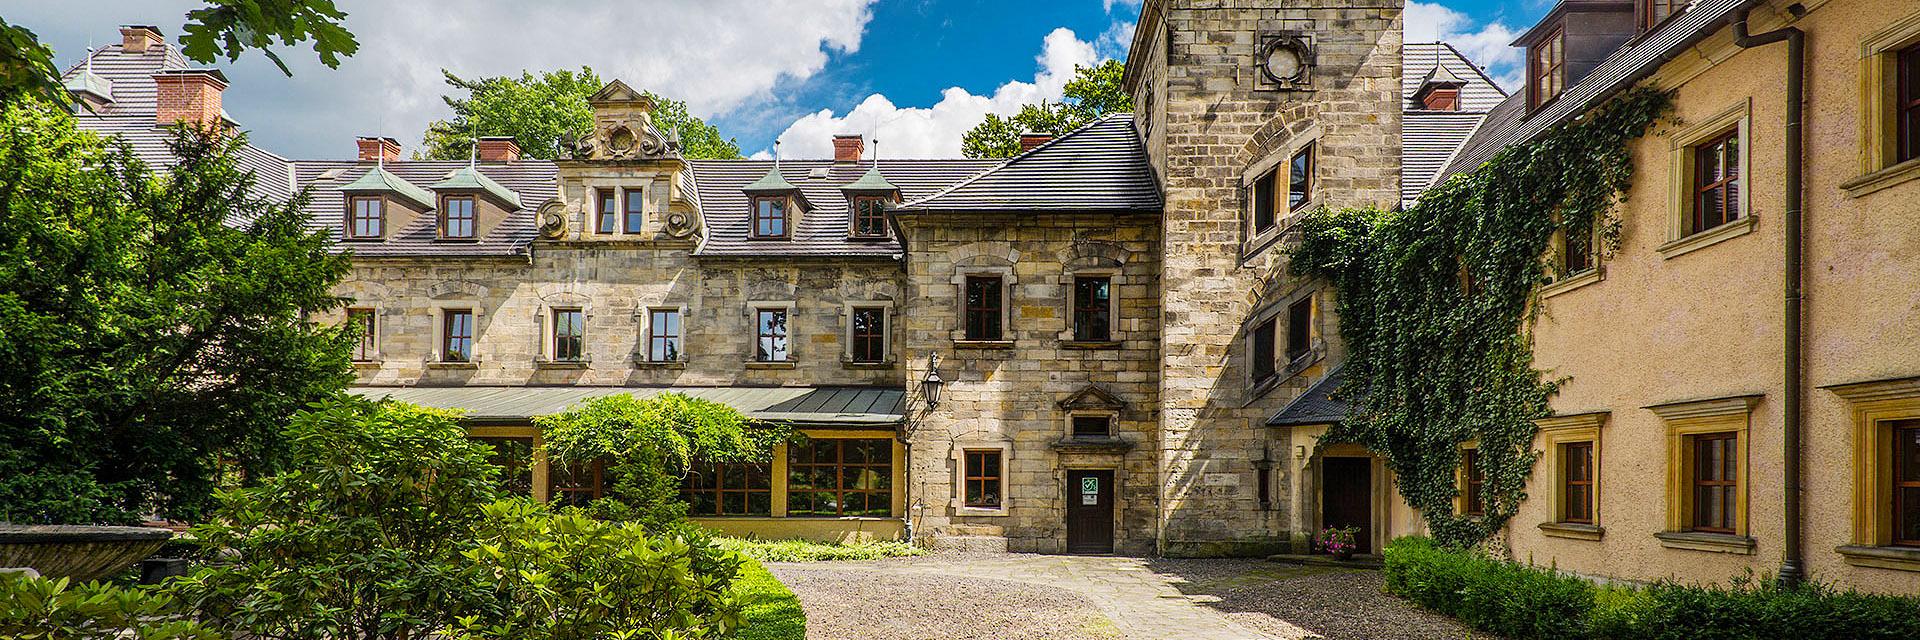 Slotsophold i Polen | Pool, wellness, gastronomi og tennis